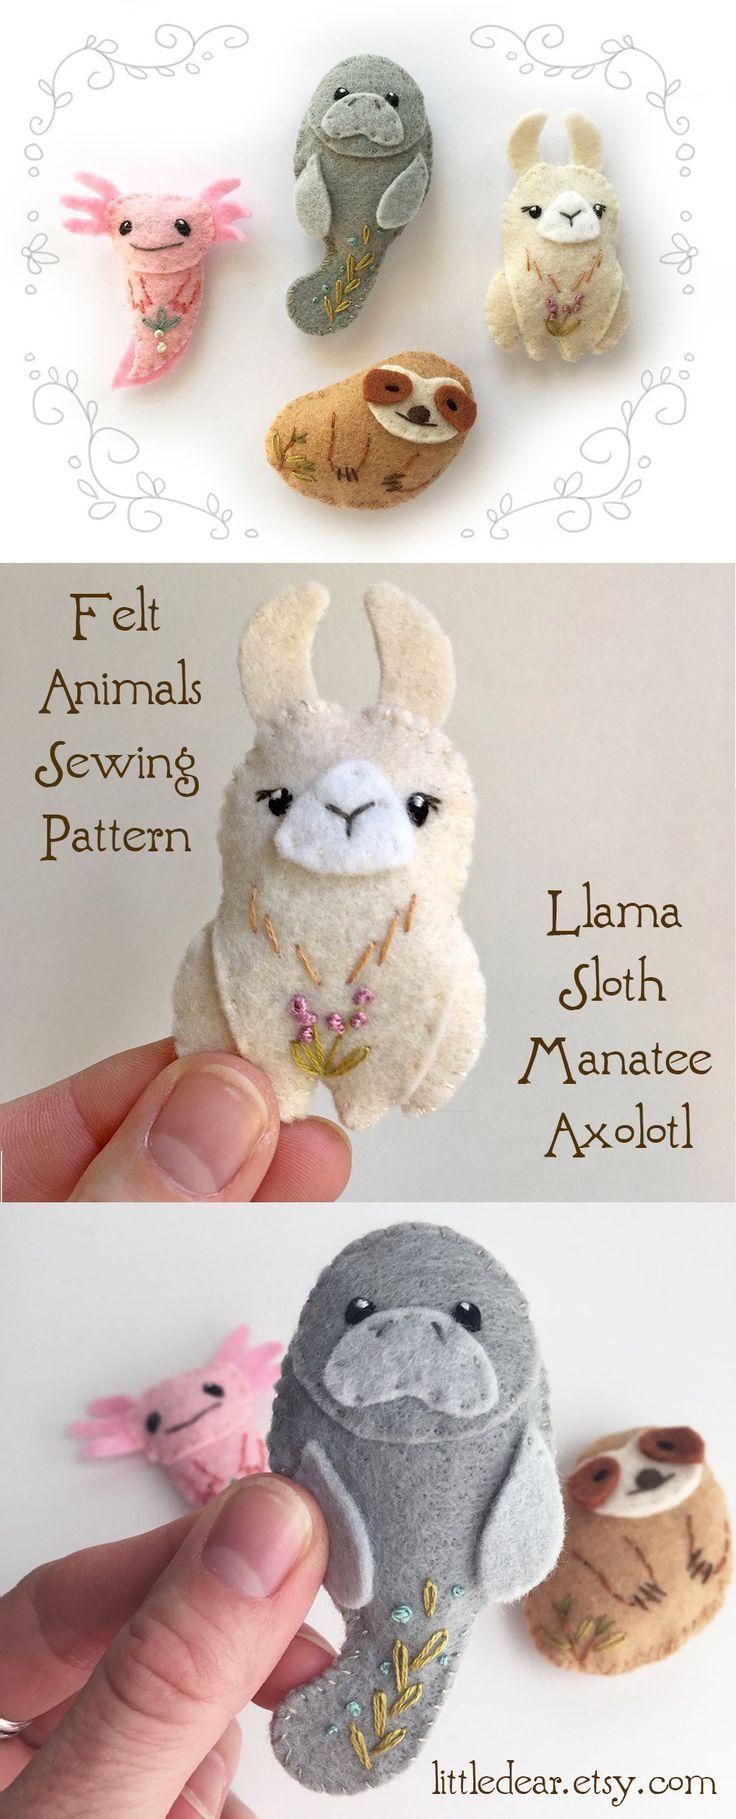 Felt Animals PDF Pattern for Unusual Creatures, Digital Download, Llama, Axolotl, Sloth, Manatee